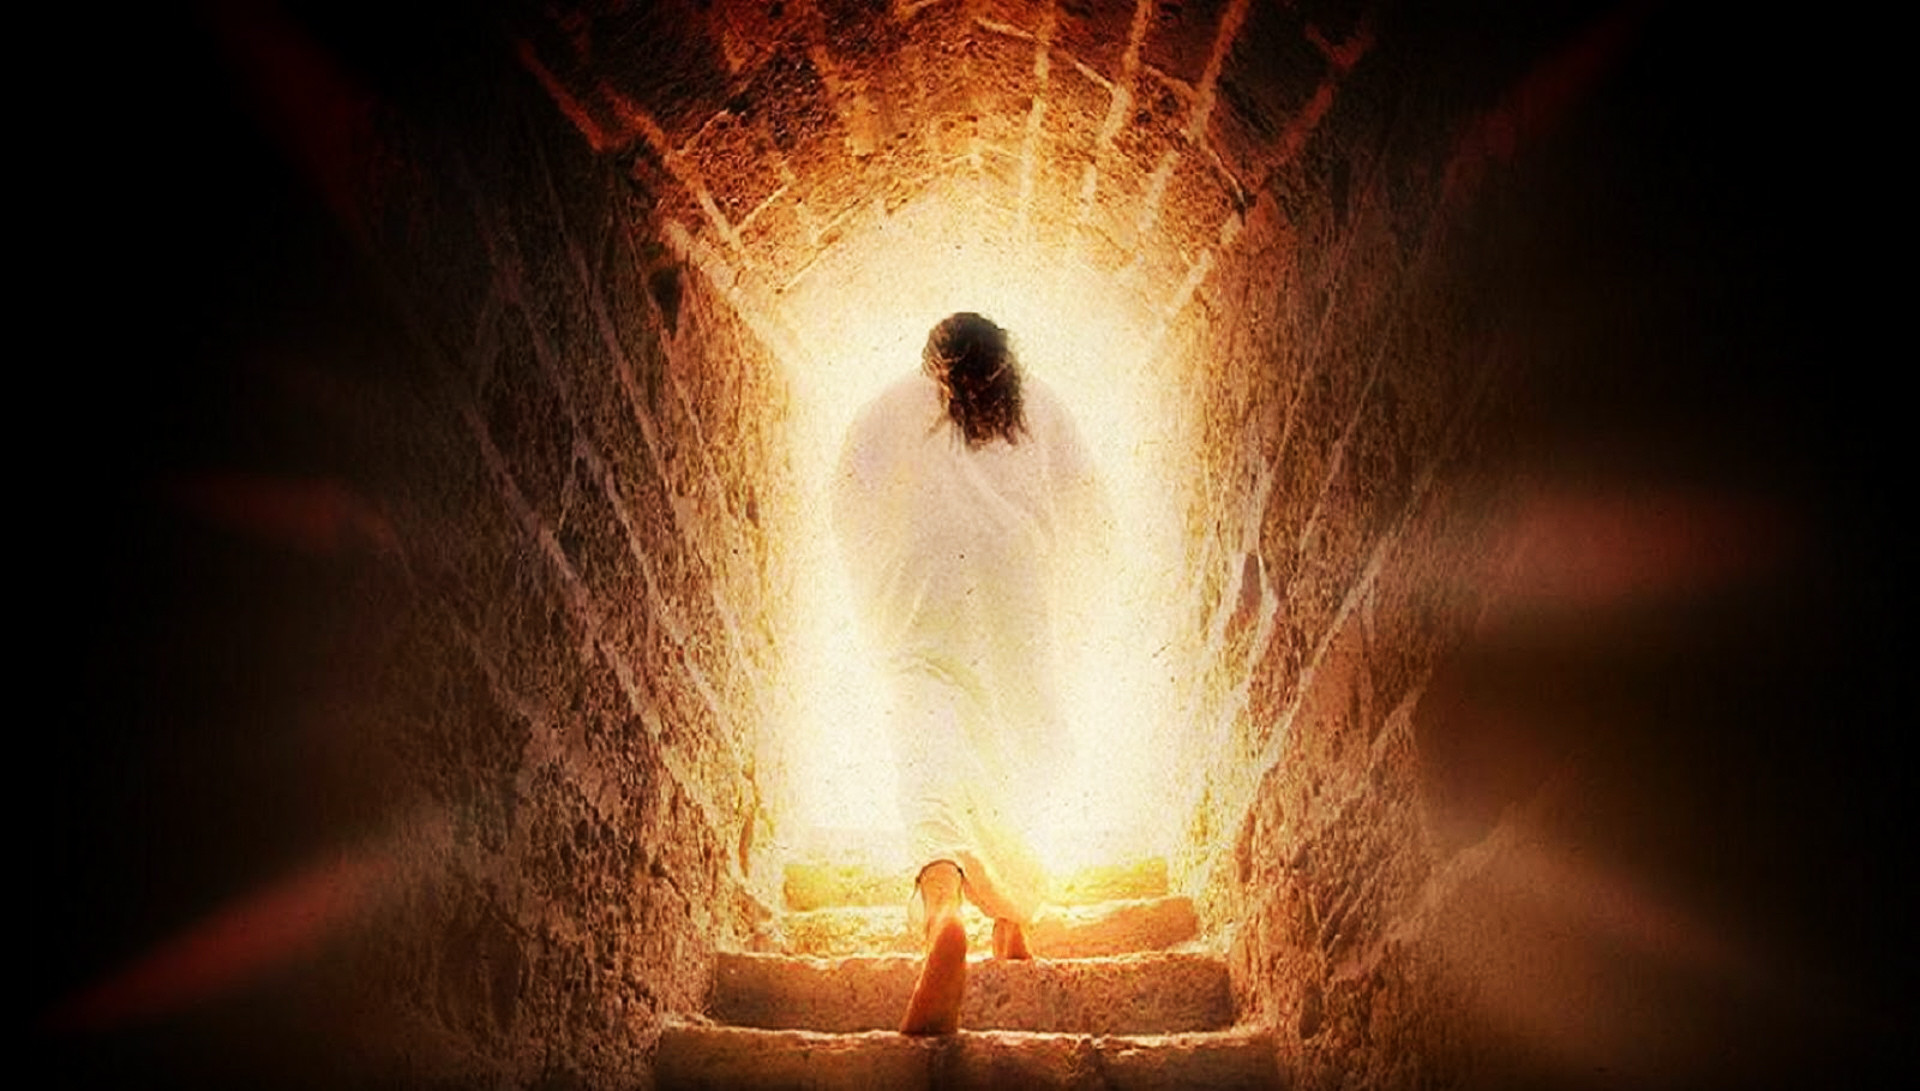 happy easter jesus risen resurrection hd wallpaper background